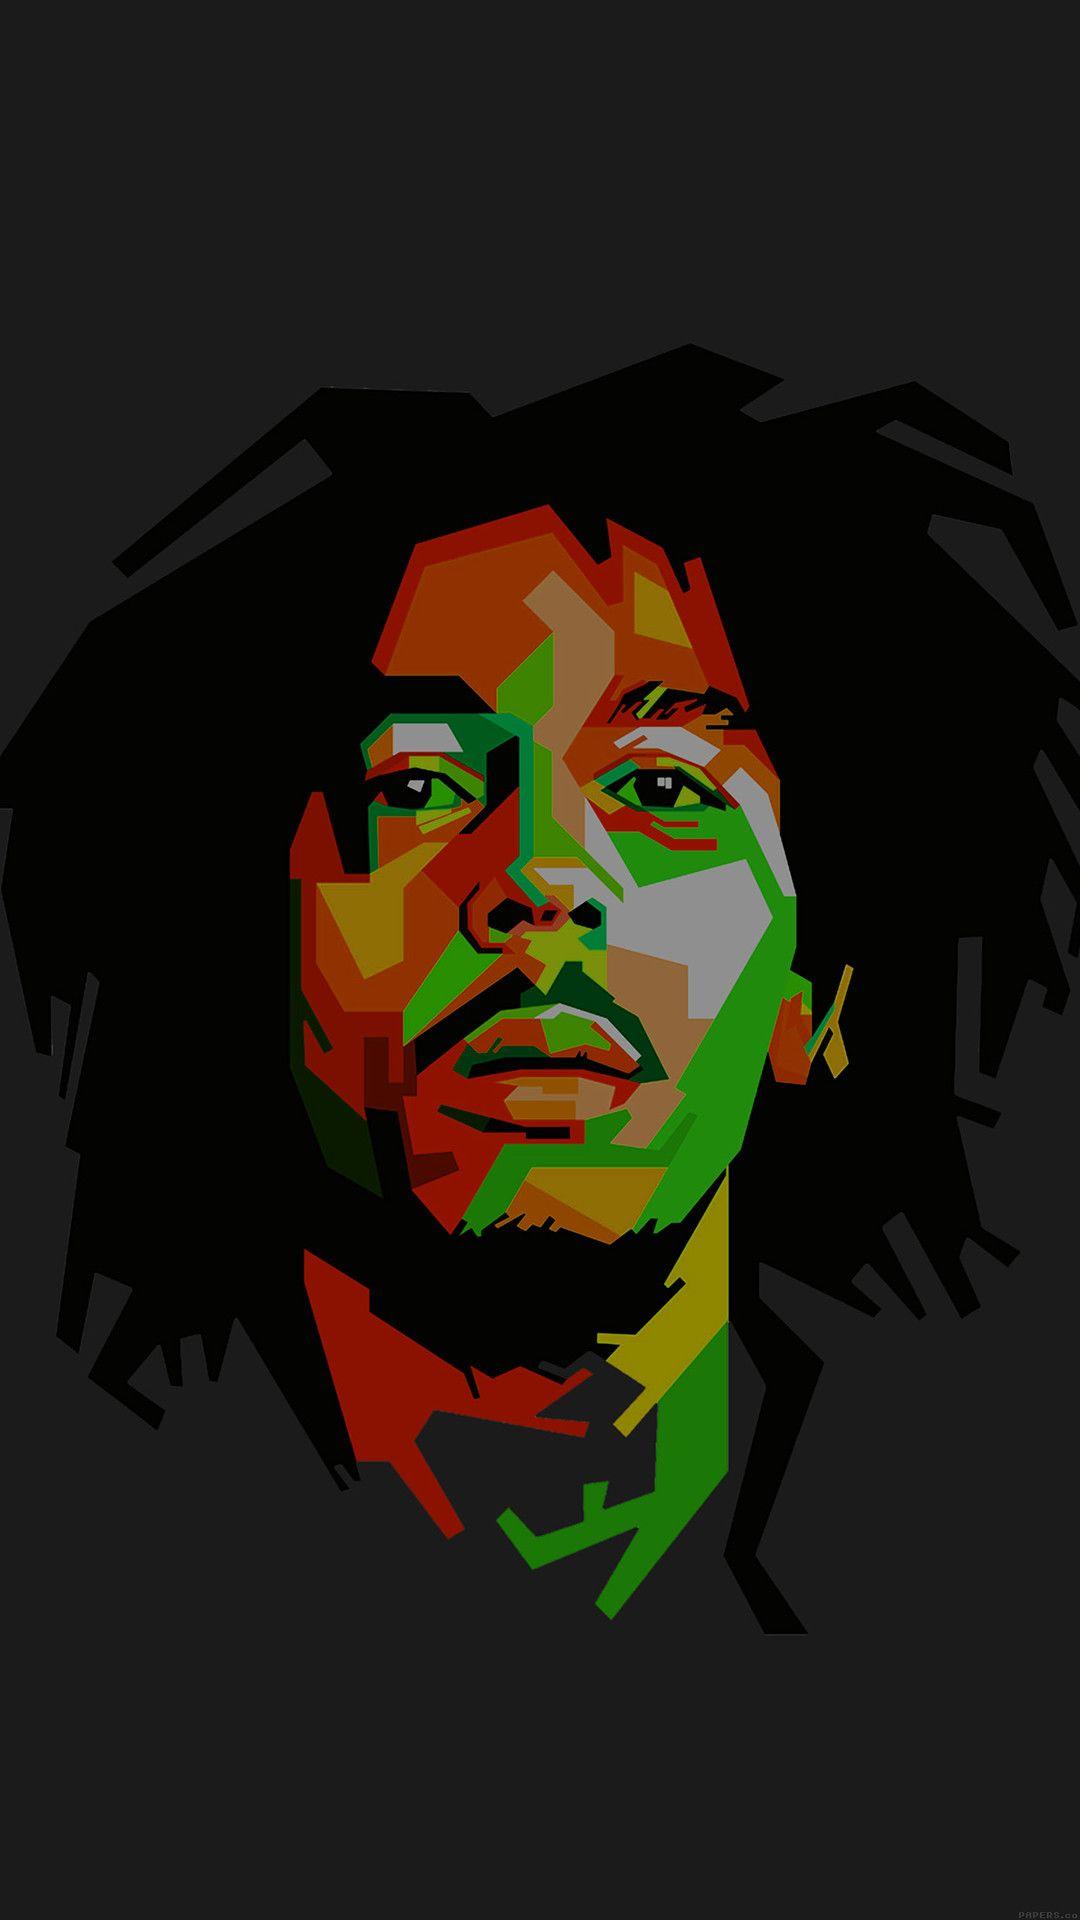 72 Bob Marley Wallpapers On Wallpaperplay Bob Marley Artwork Bob Marley Art Bob Marley Painting